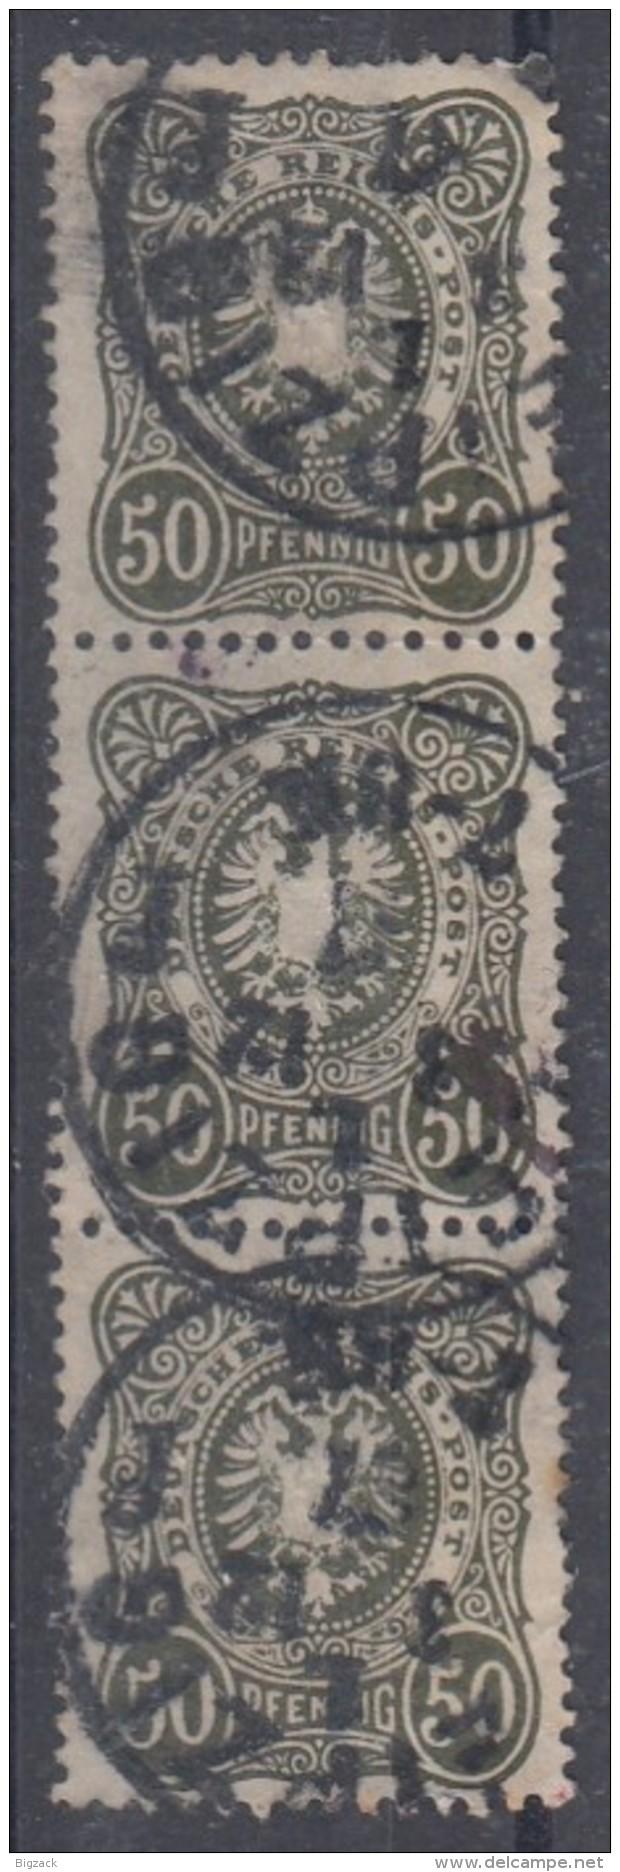 DR Minr.44 Senkrechter 3er Streifen Gestempelt - Deutschland